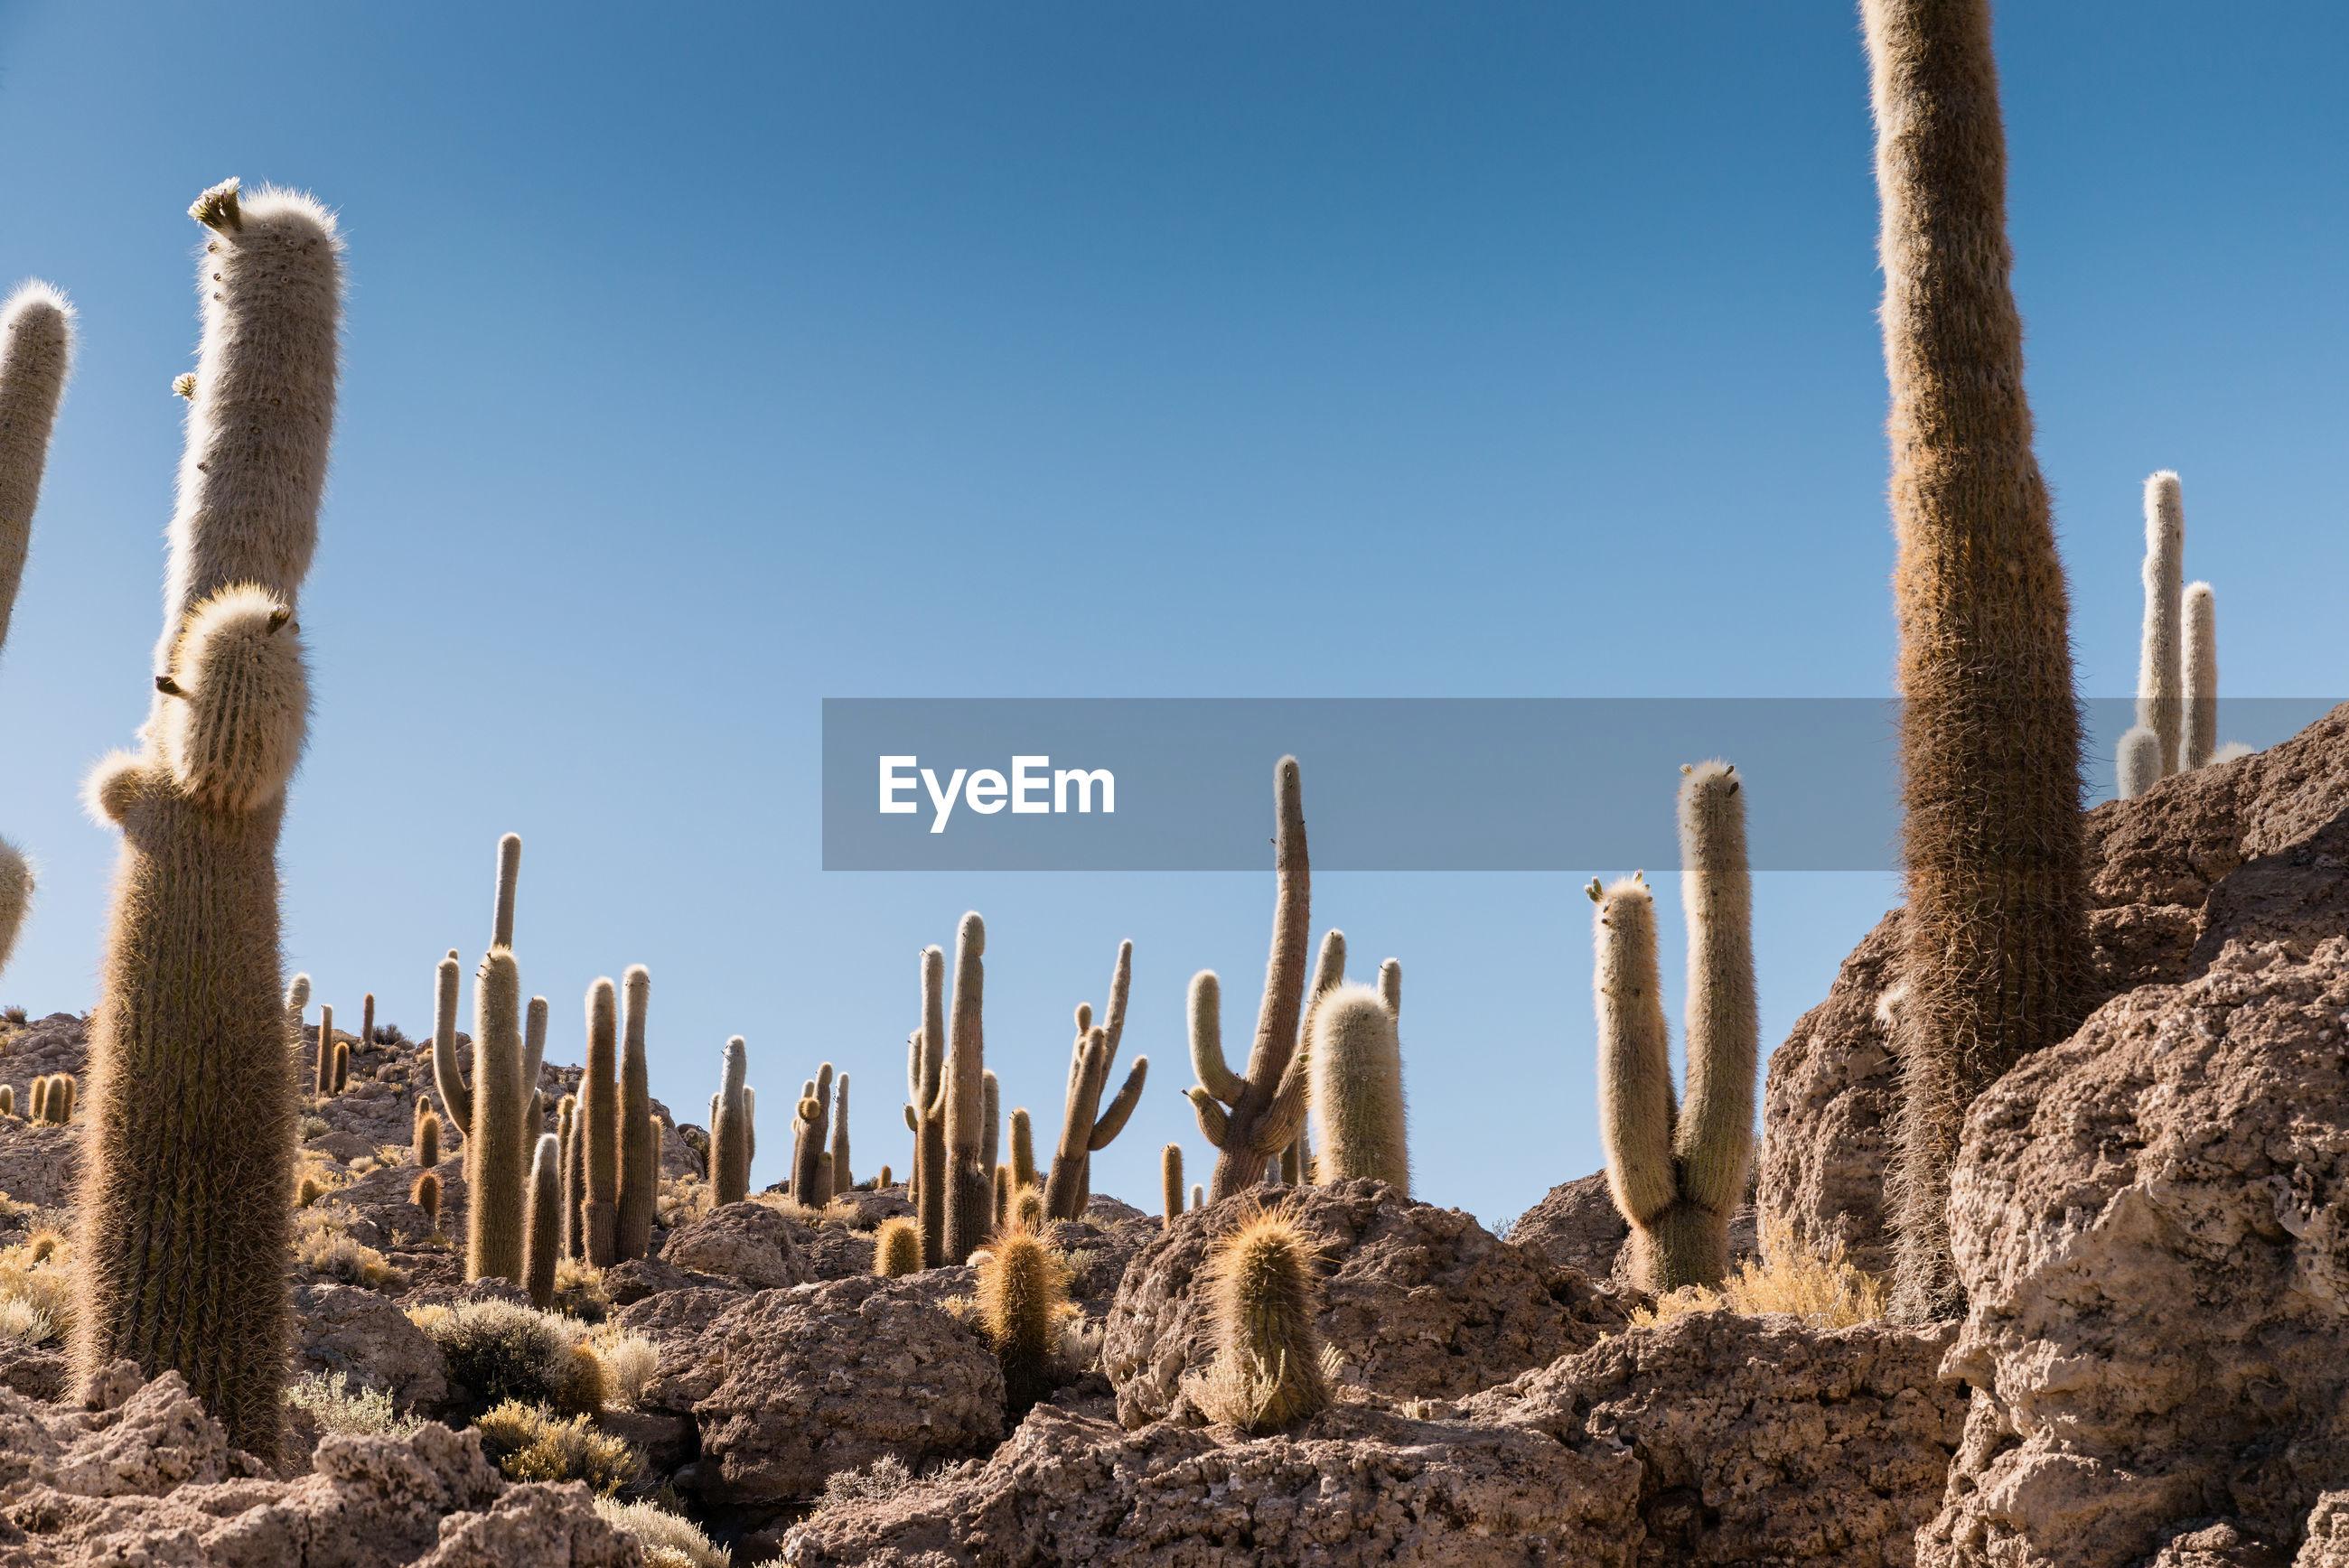 Cactus on landscape against clear blue sky at desert